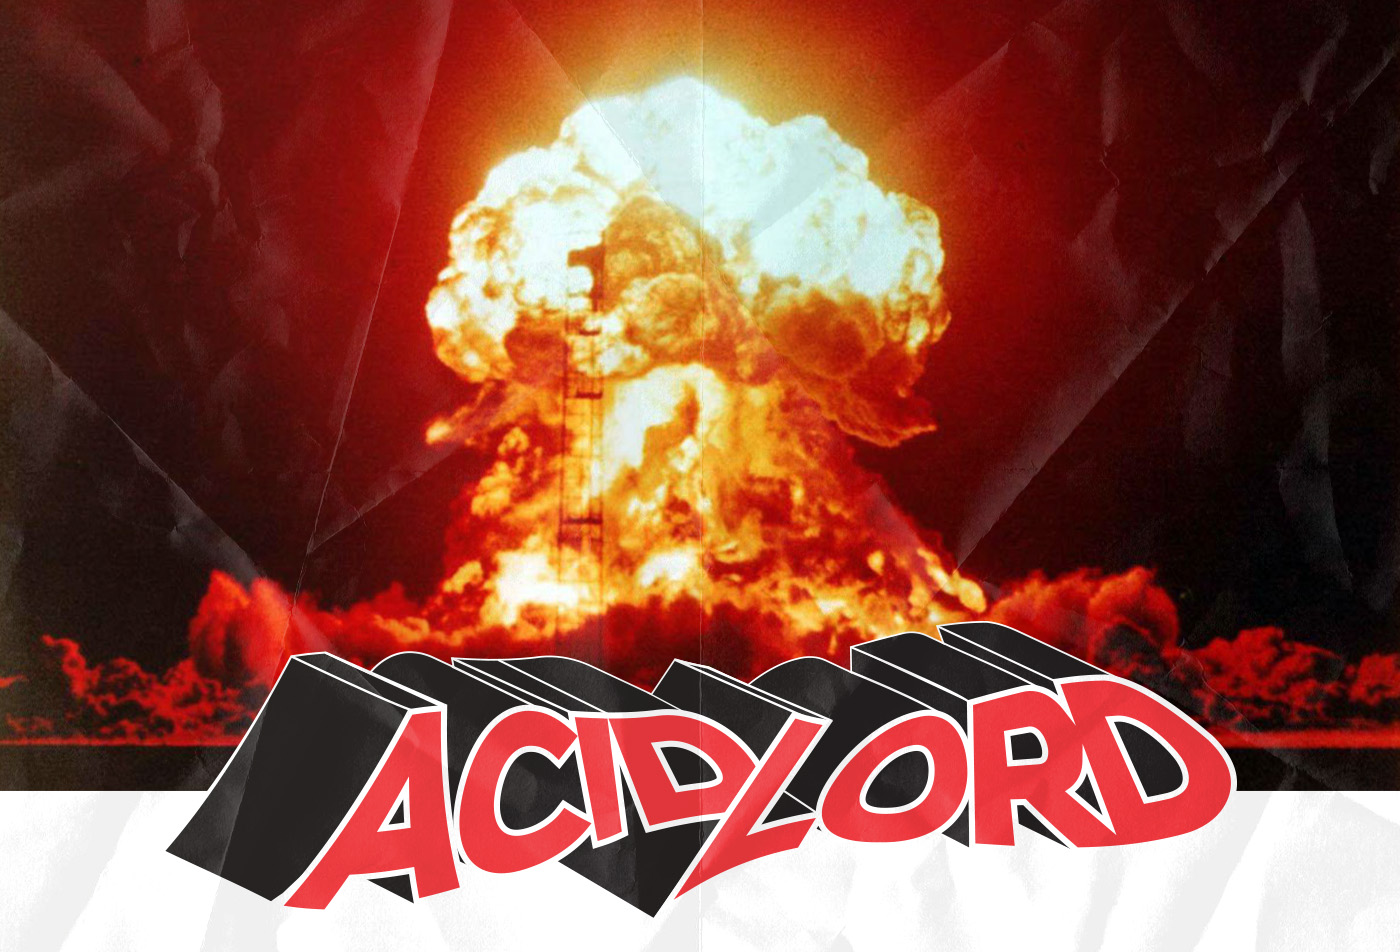 Acid_Lord_horizontallogoSkateStickerBOMB.jpg